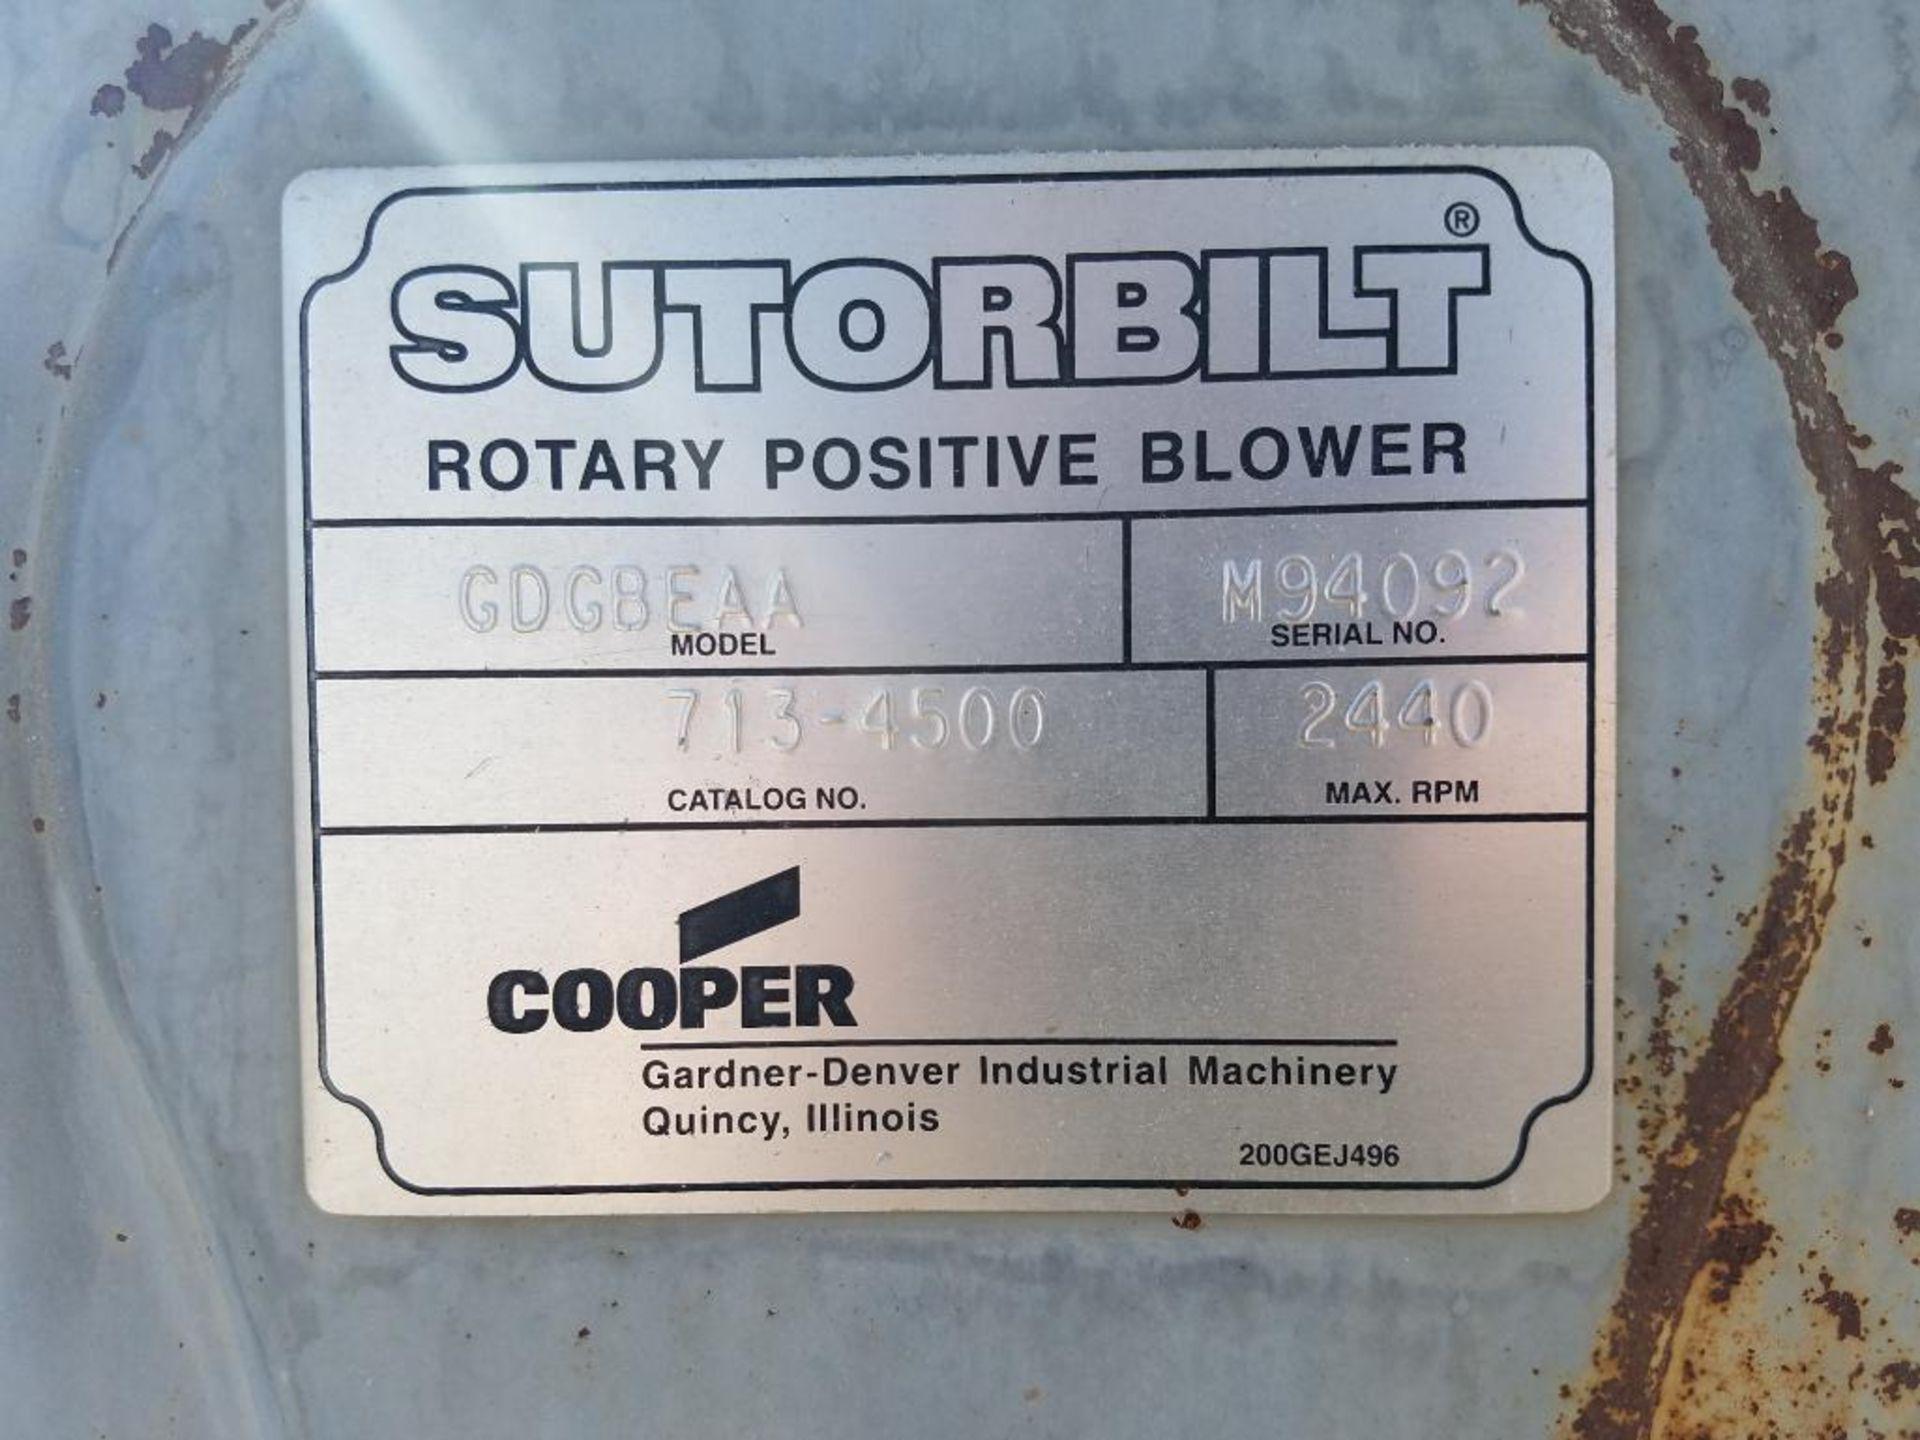 Sutorbilt rotary positive blower - Image 5 of 7